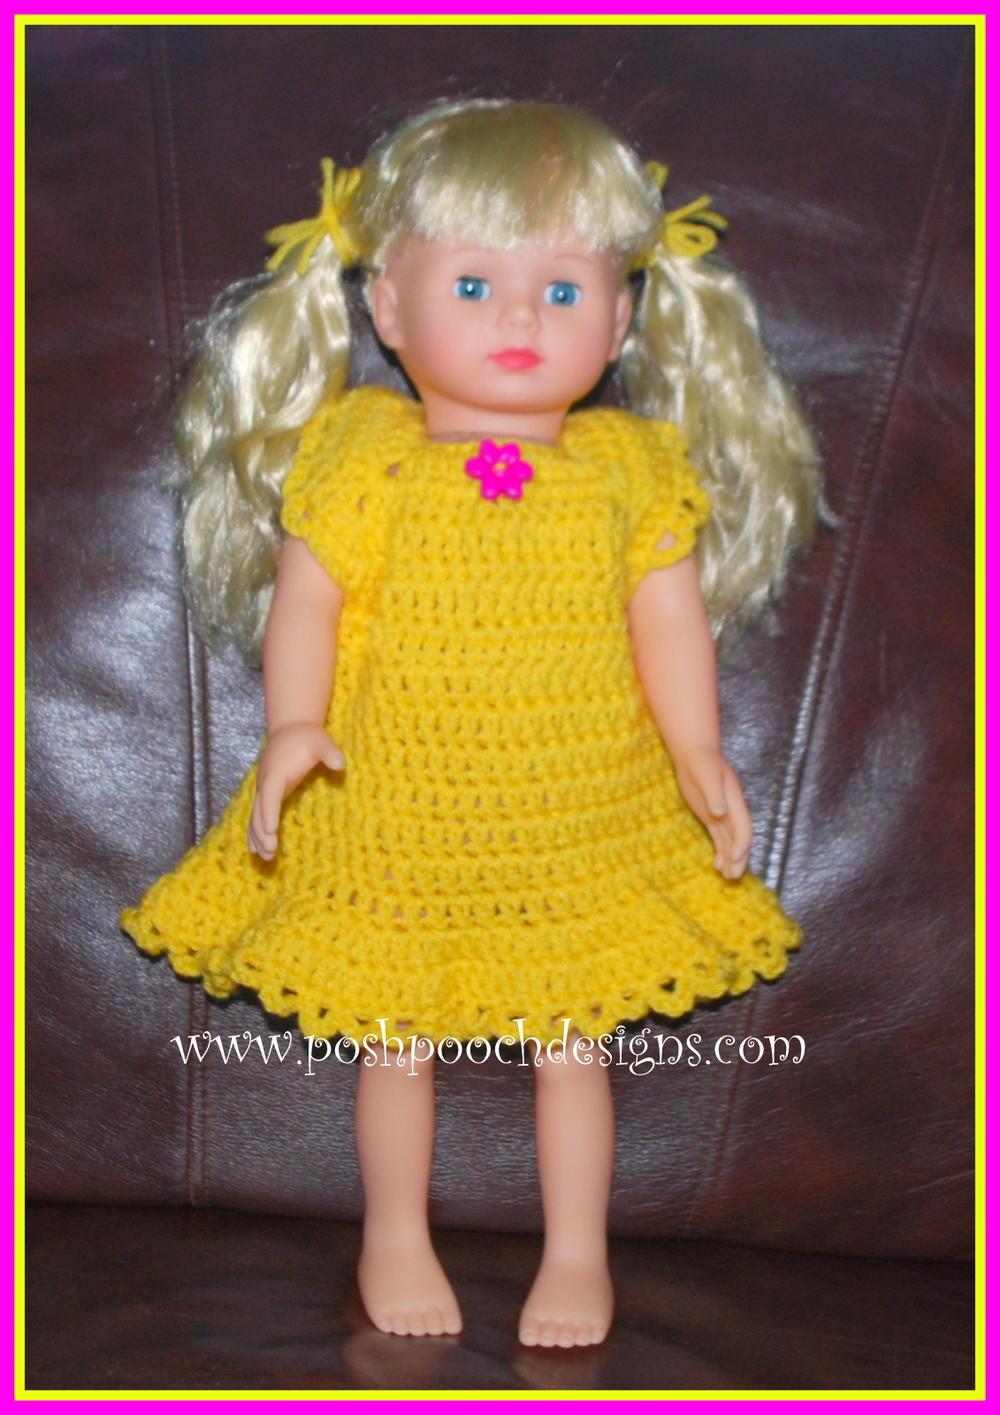 Simple Doll Dress For 18 Inch Dolls Allfreecrochet Com